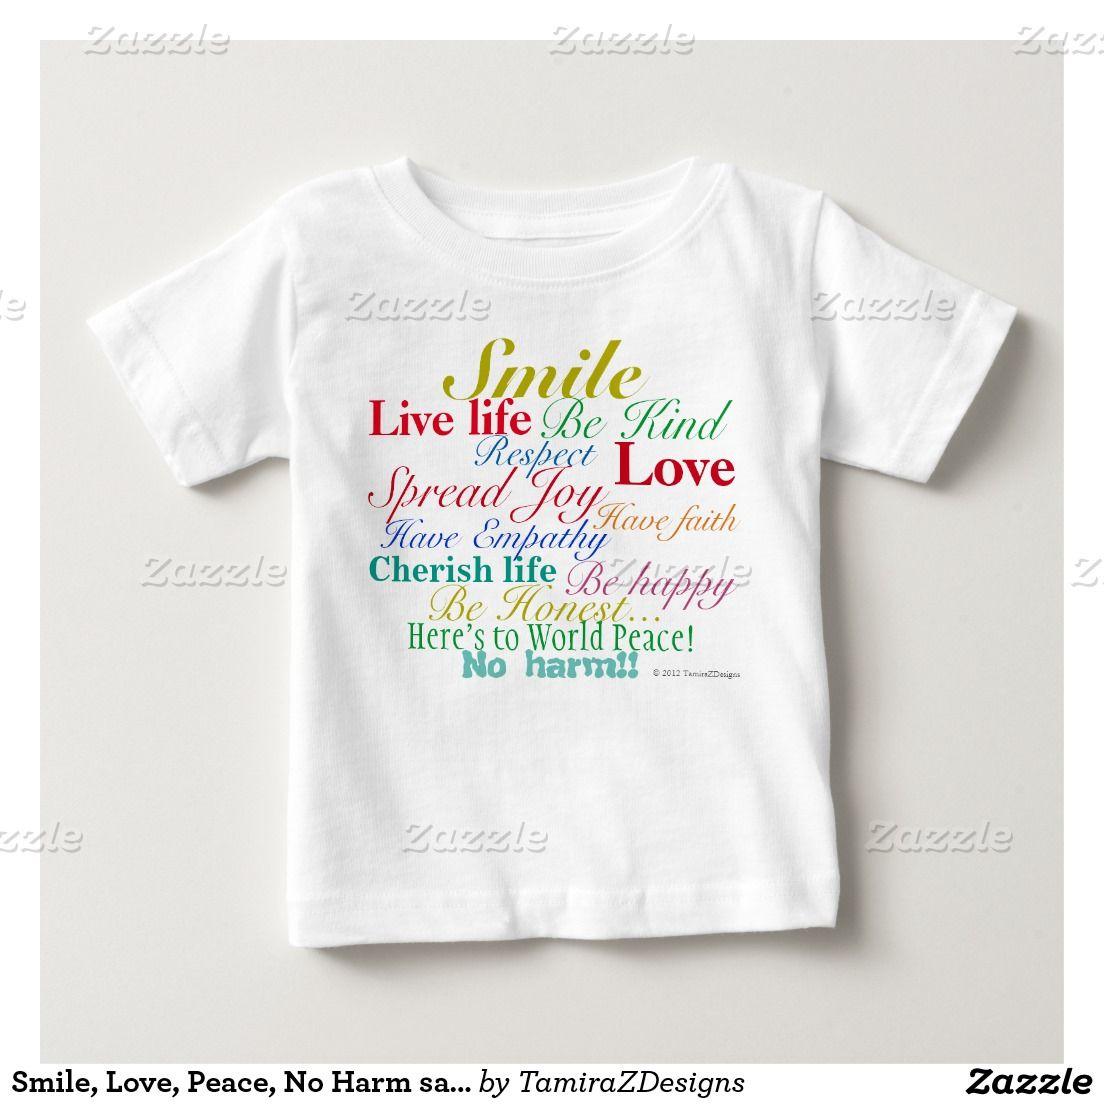 Zazzle t shirt design size - Smile Love Peace No Harm Sayings Tee Shirts Colorful Positive Shirt Design